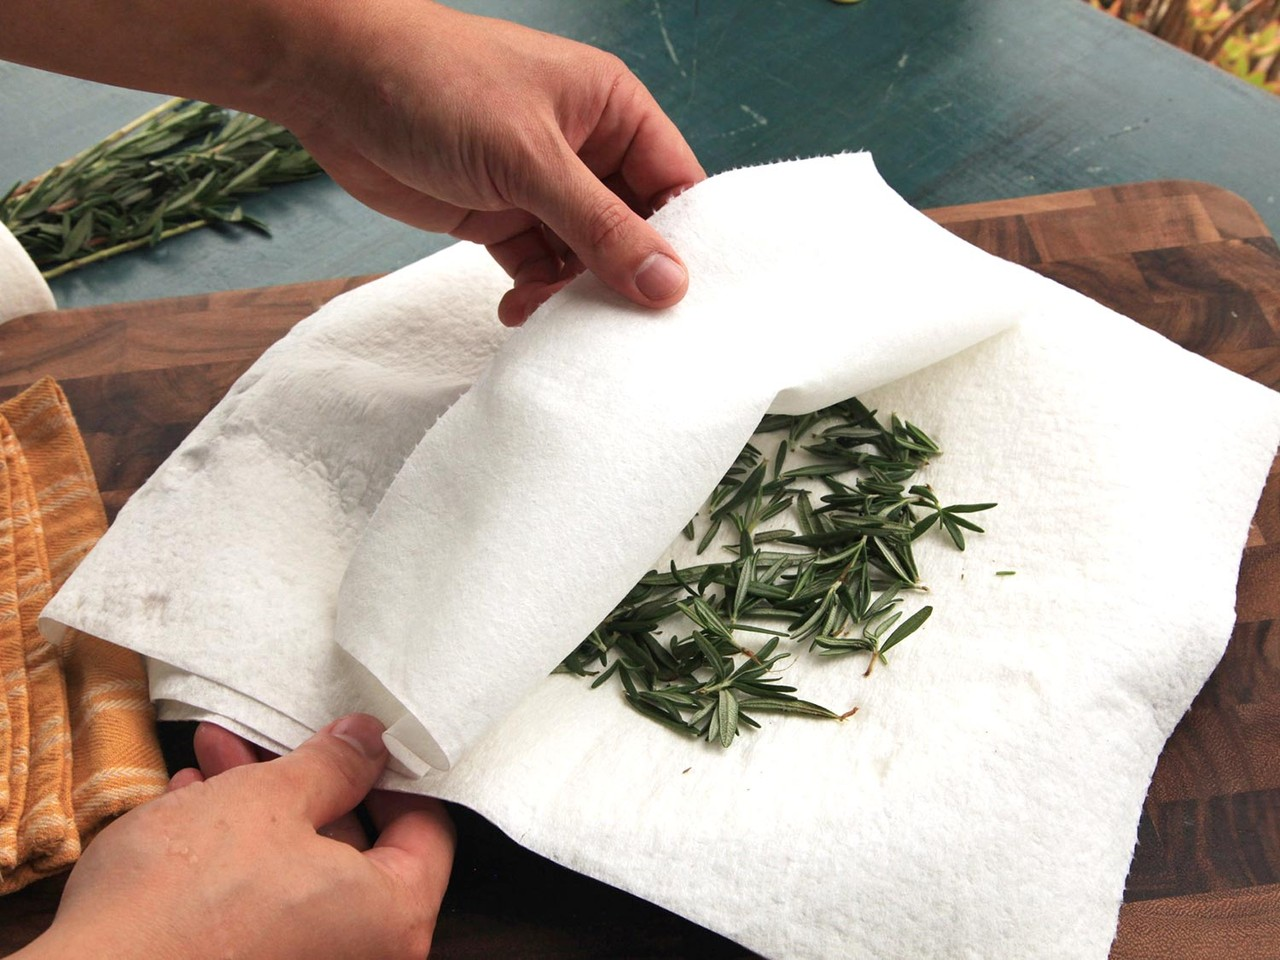 20150317-drying-herbs-storage-2.jpg